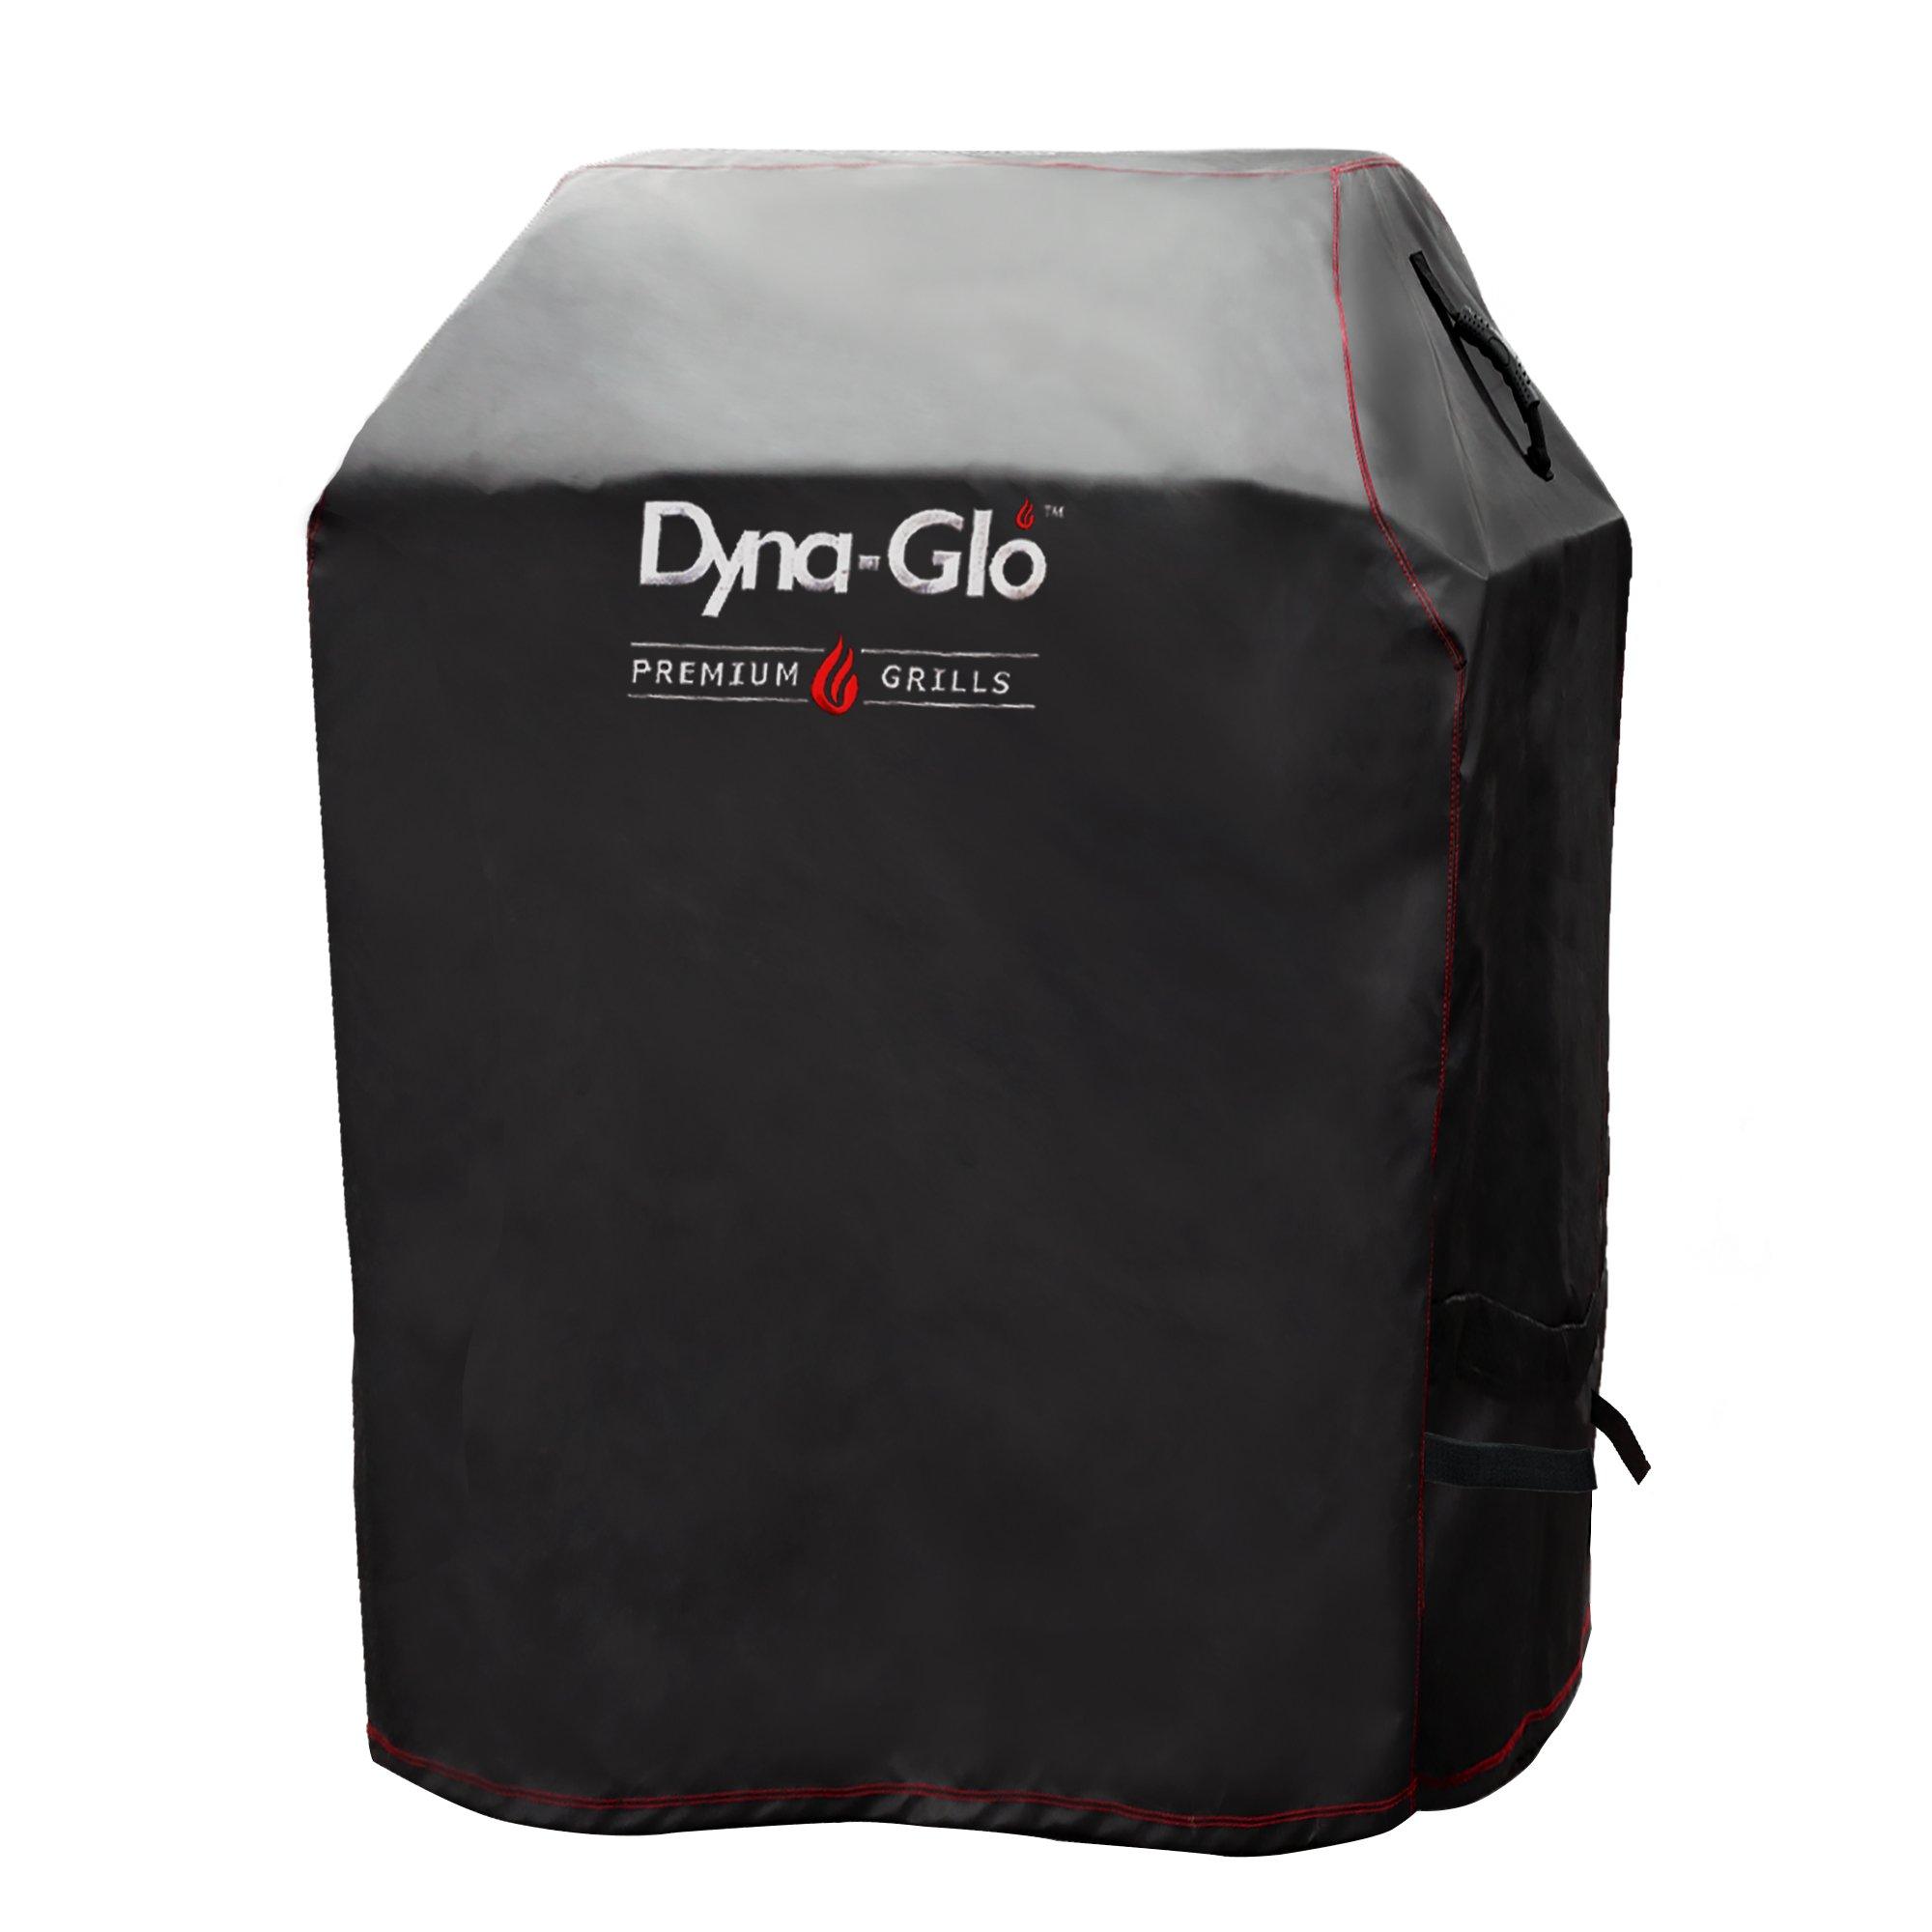 Dyna Glo DG300C Premium Small Space